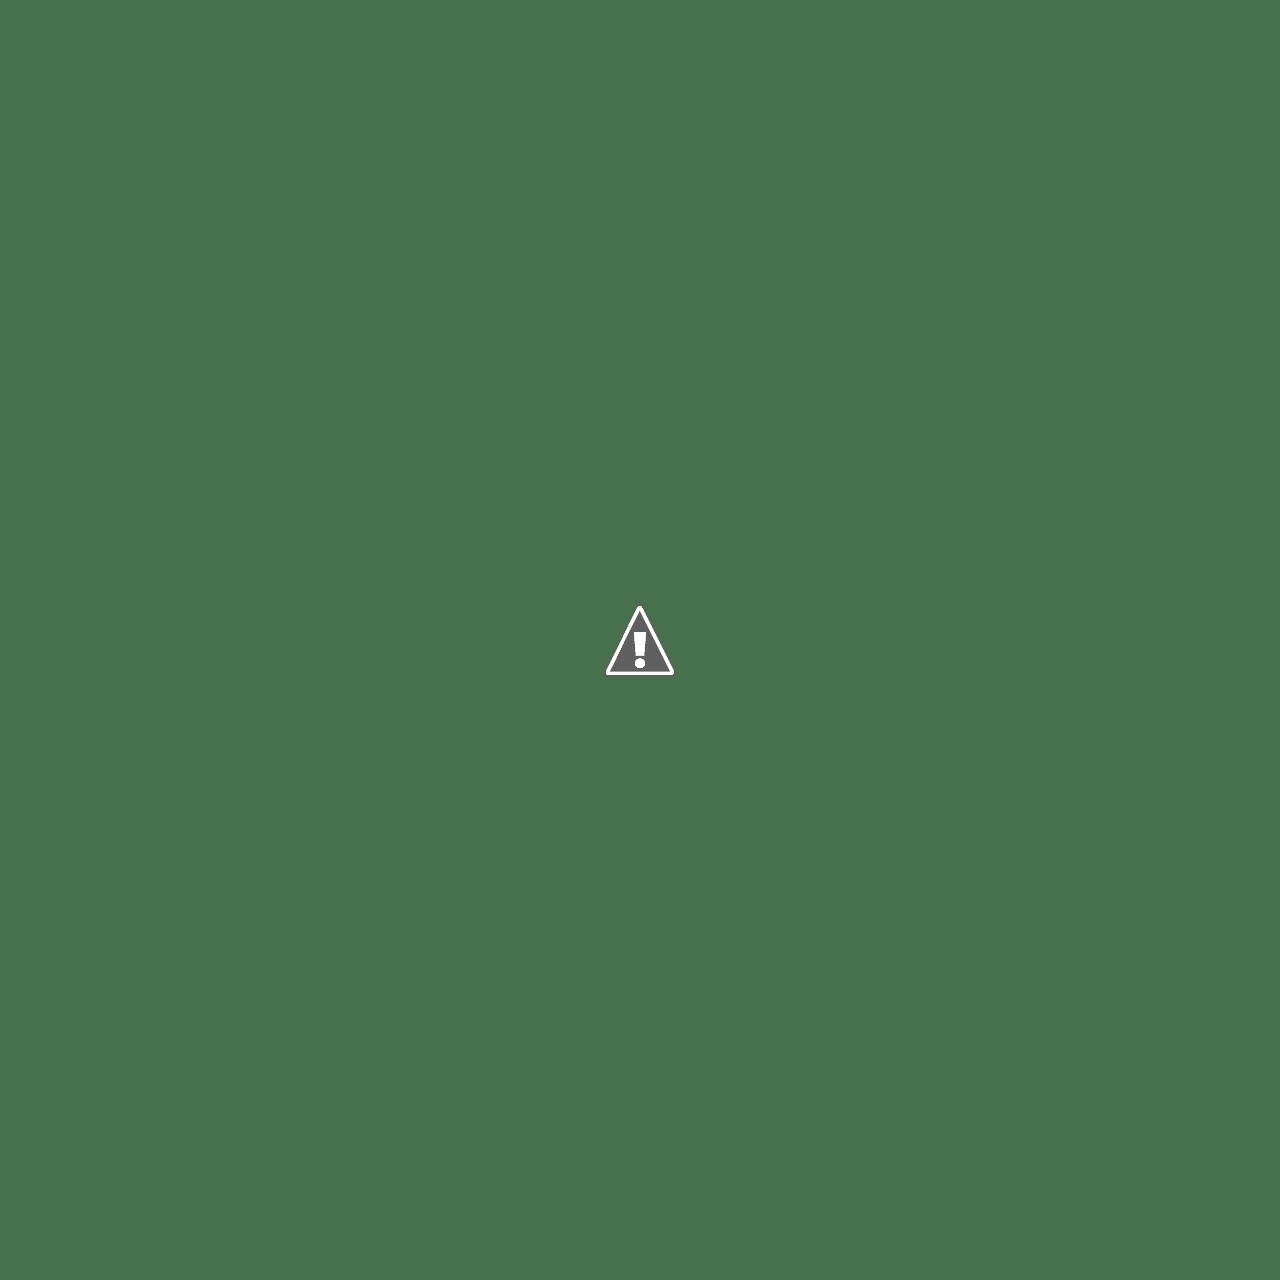 Golden Underwear - Toko Pakaian Dalam e8a52c6d52